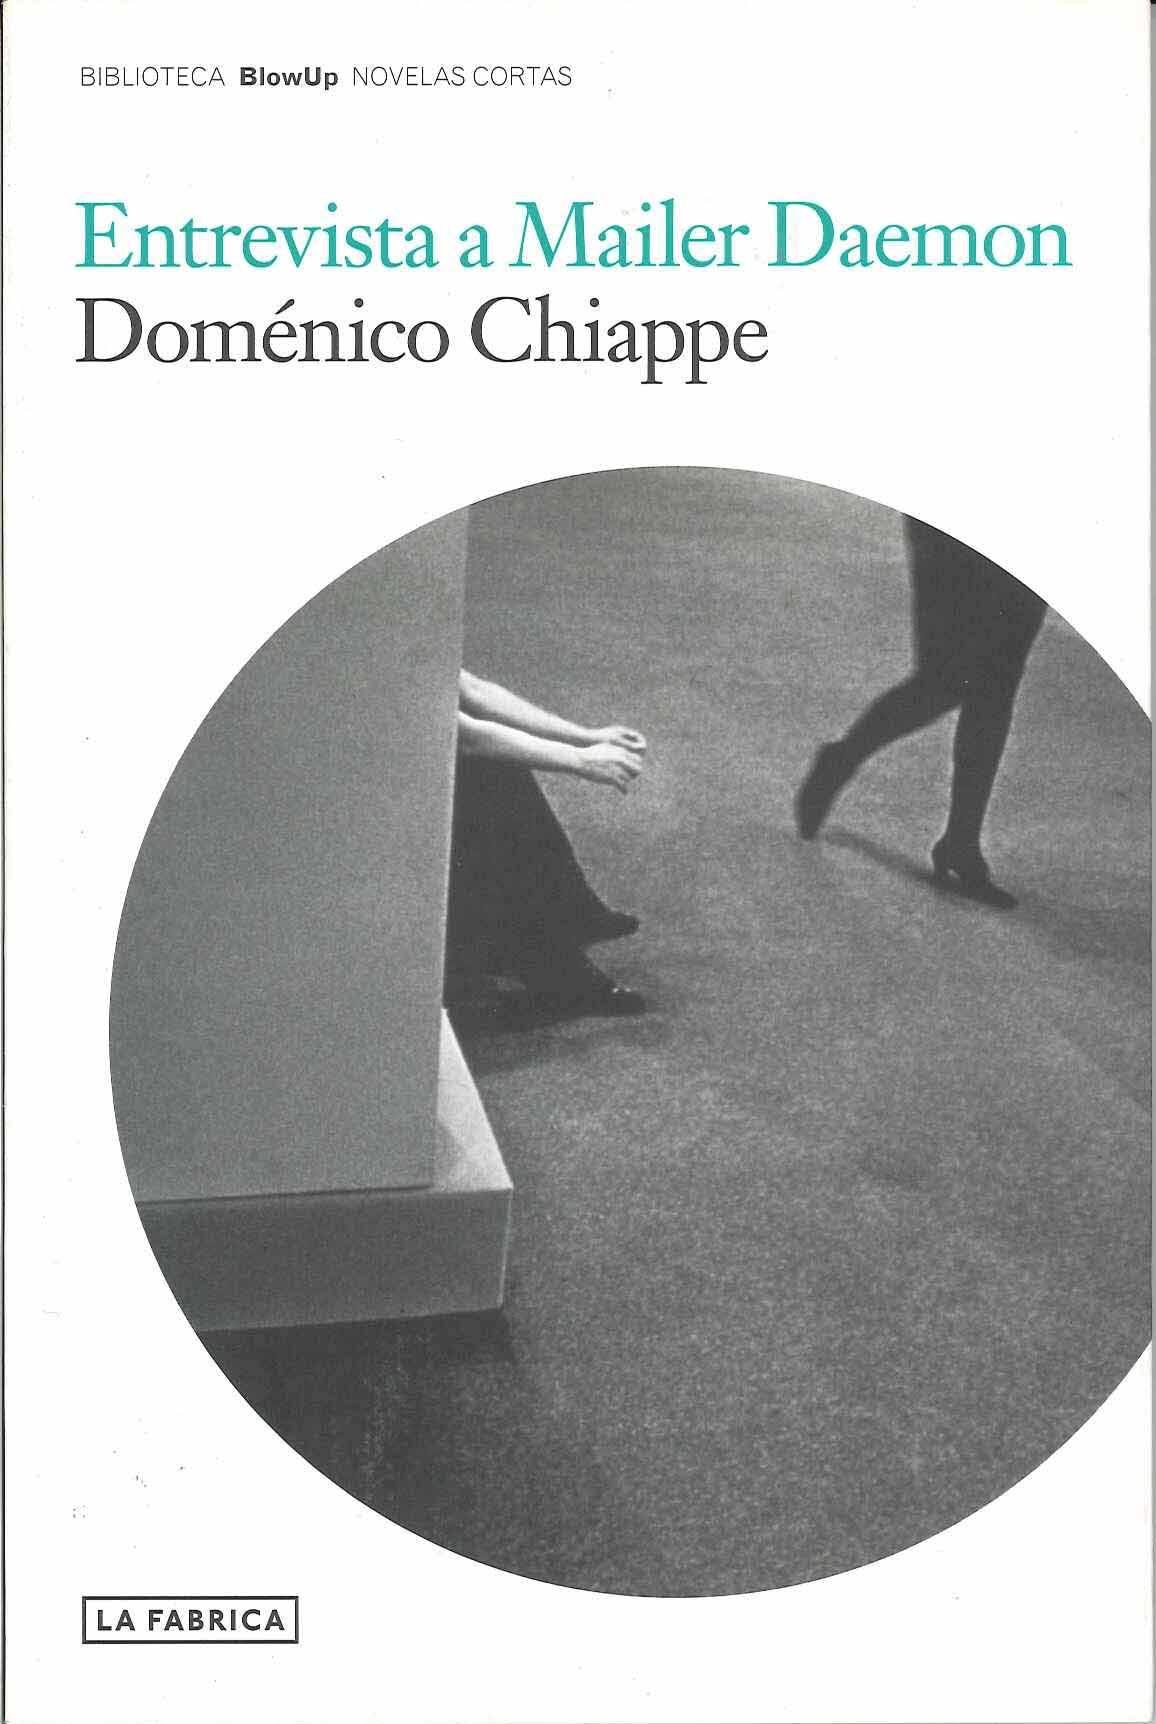 Entrevista A Mailer Daemon - Chiappe Domenico